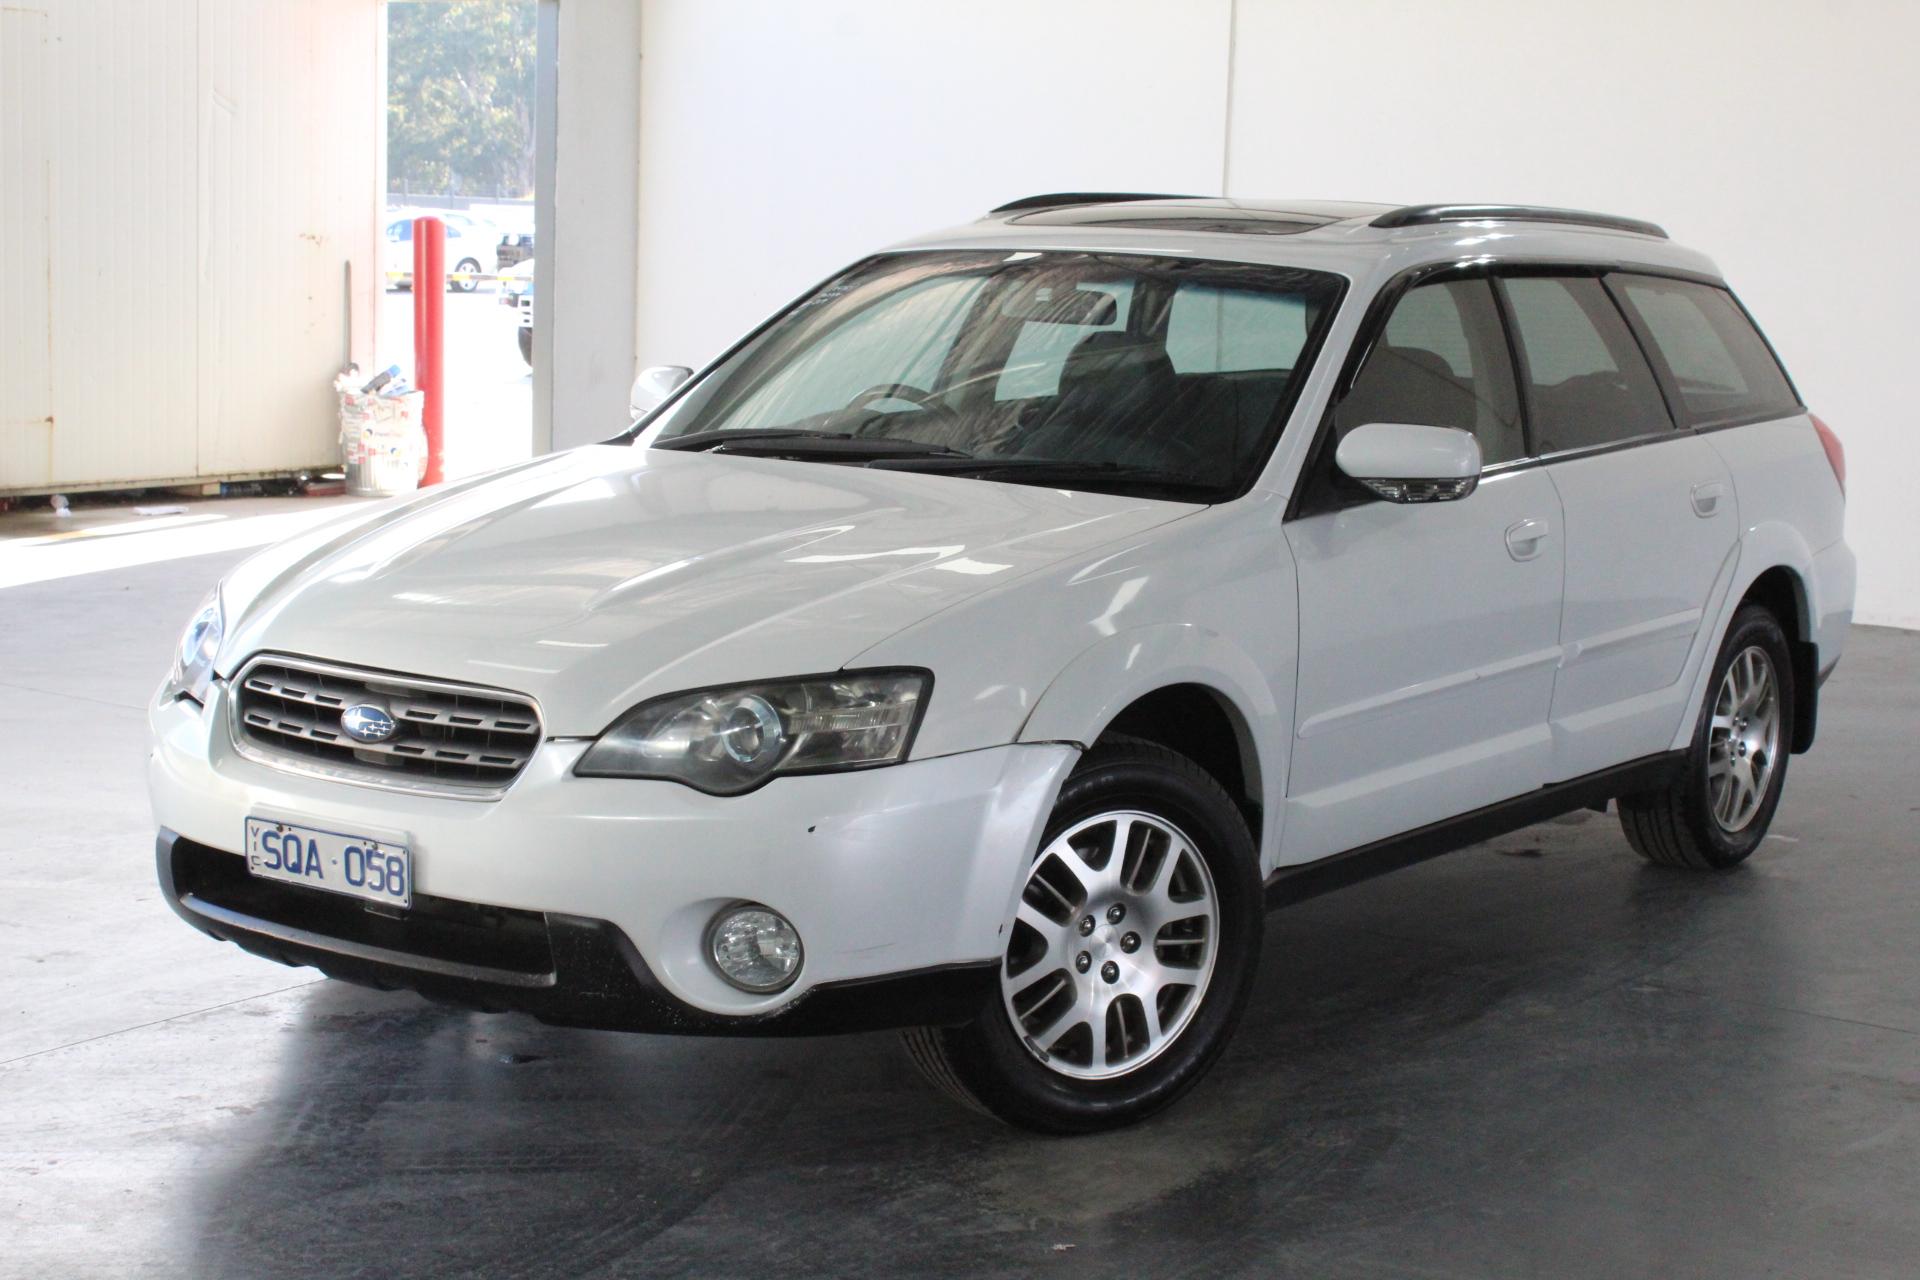 2003 Subaru Outback 2.5i Luxury B4A Automatic Wagon